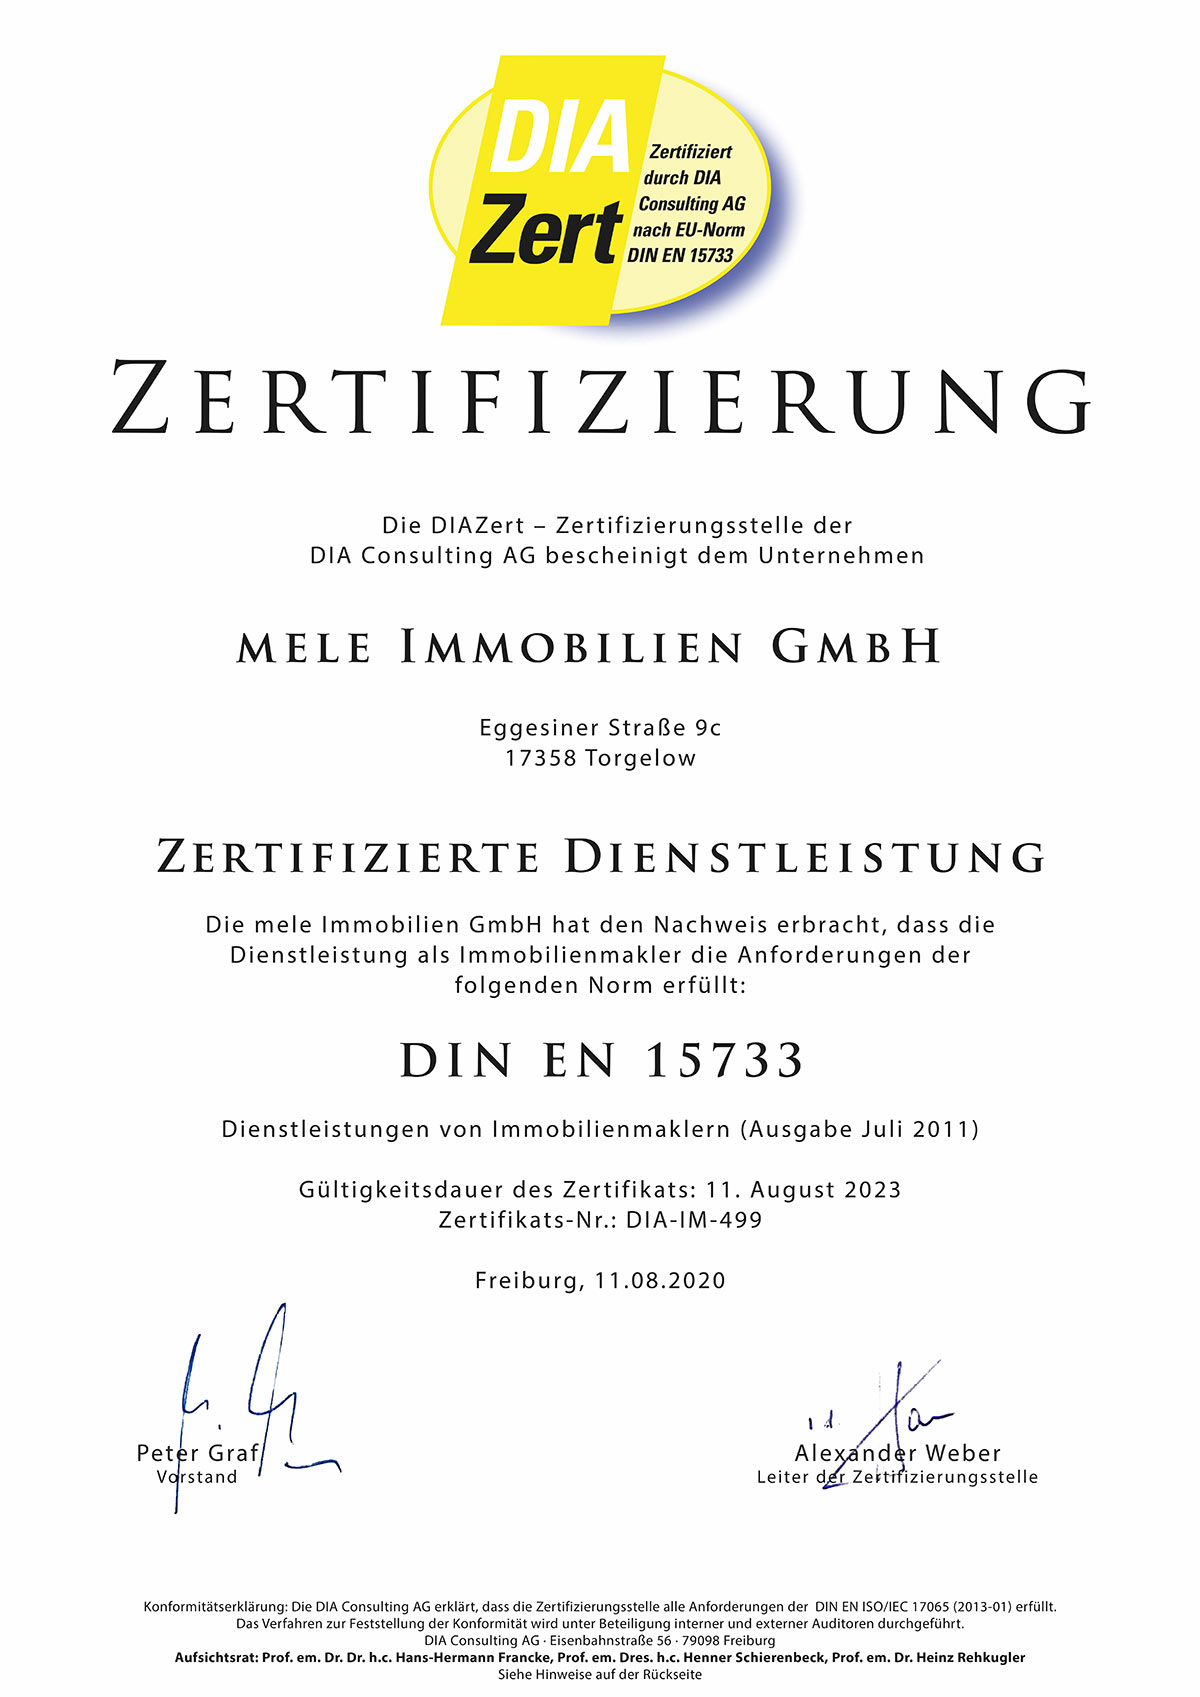 DIA_Zertifikat_DIN-EN-15733_11.08